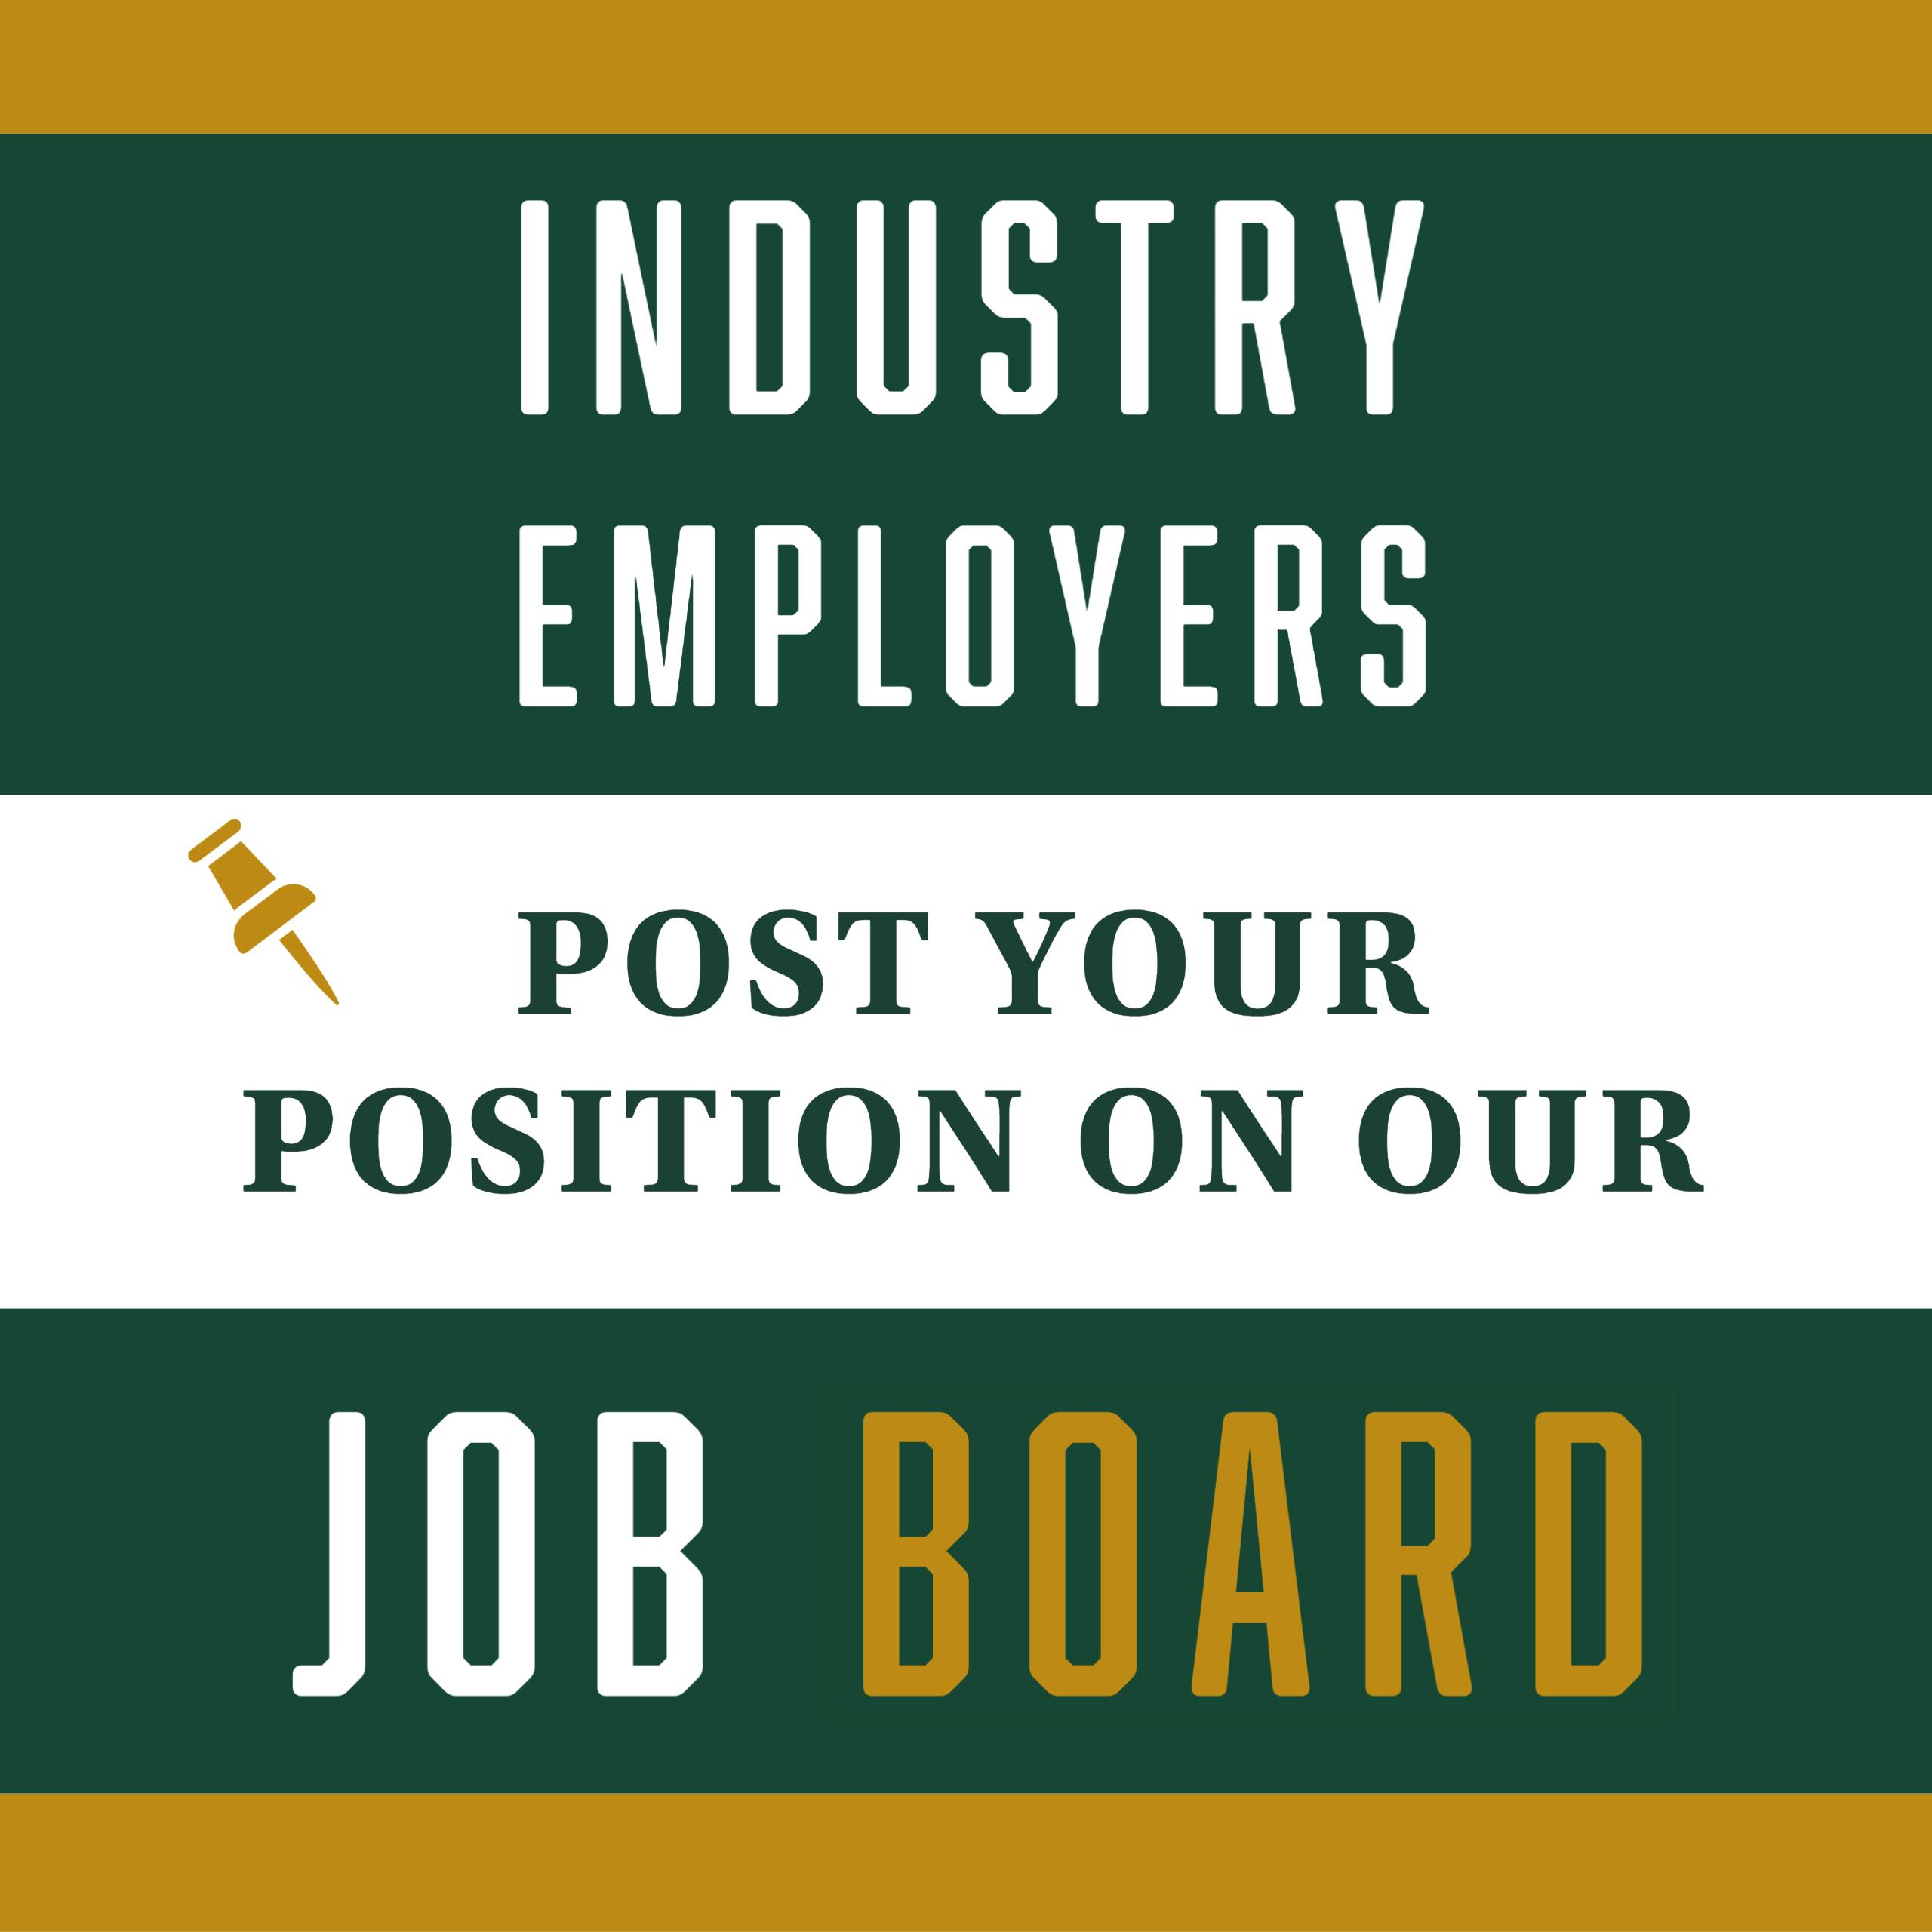 Post to Job Board